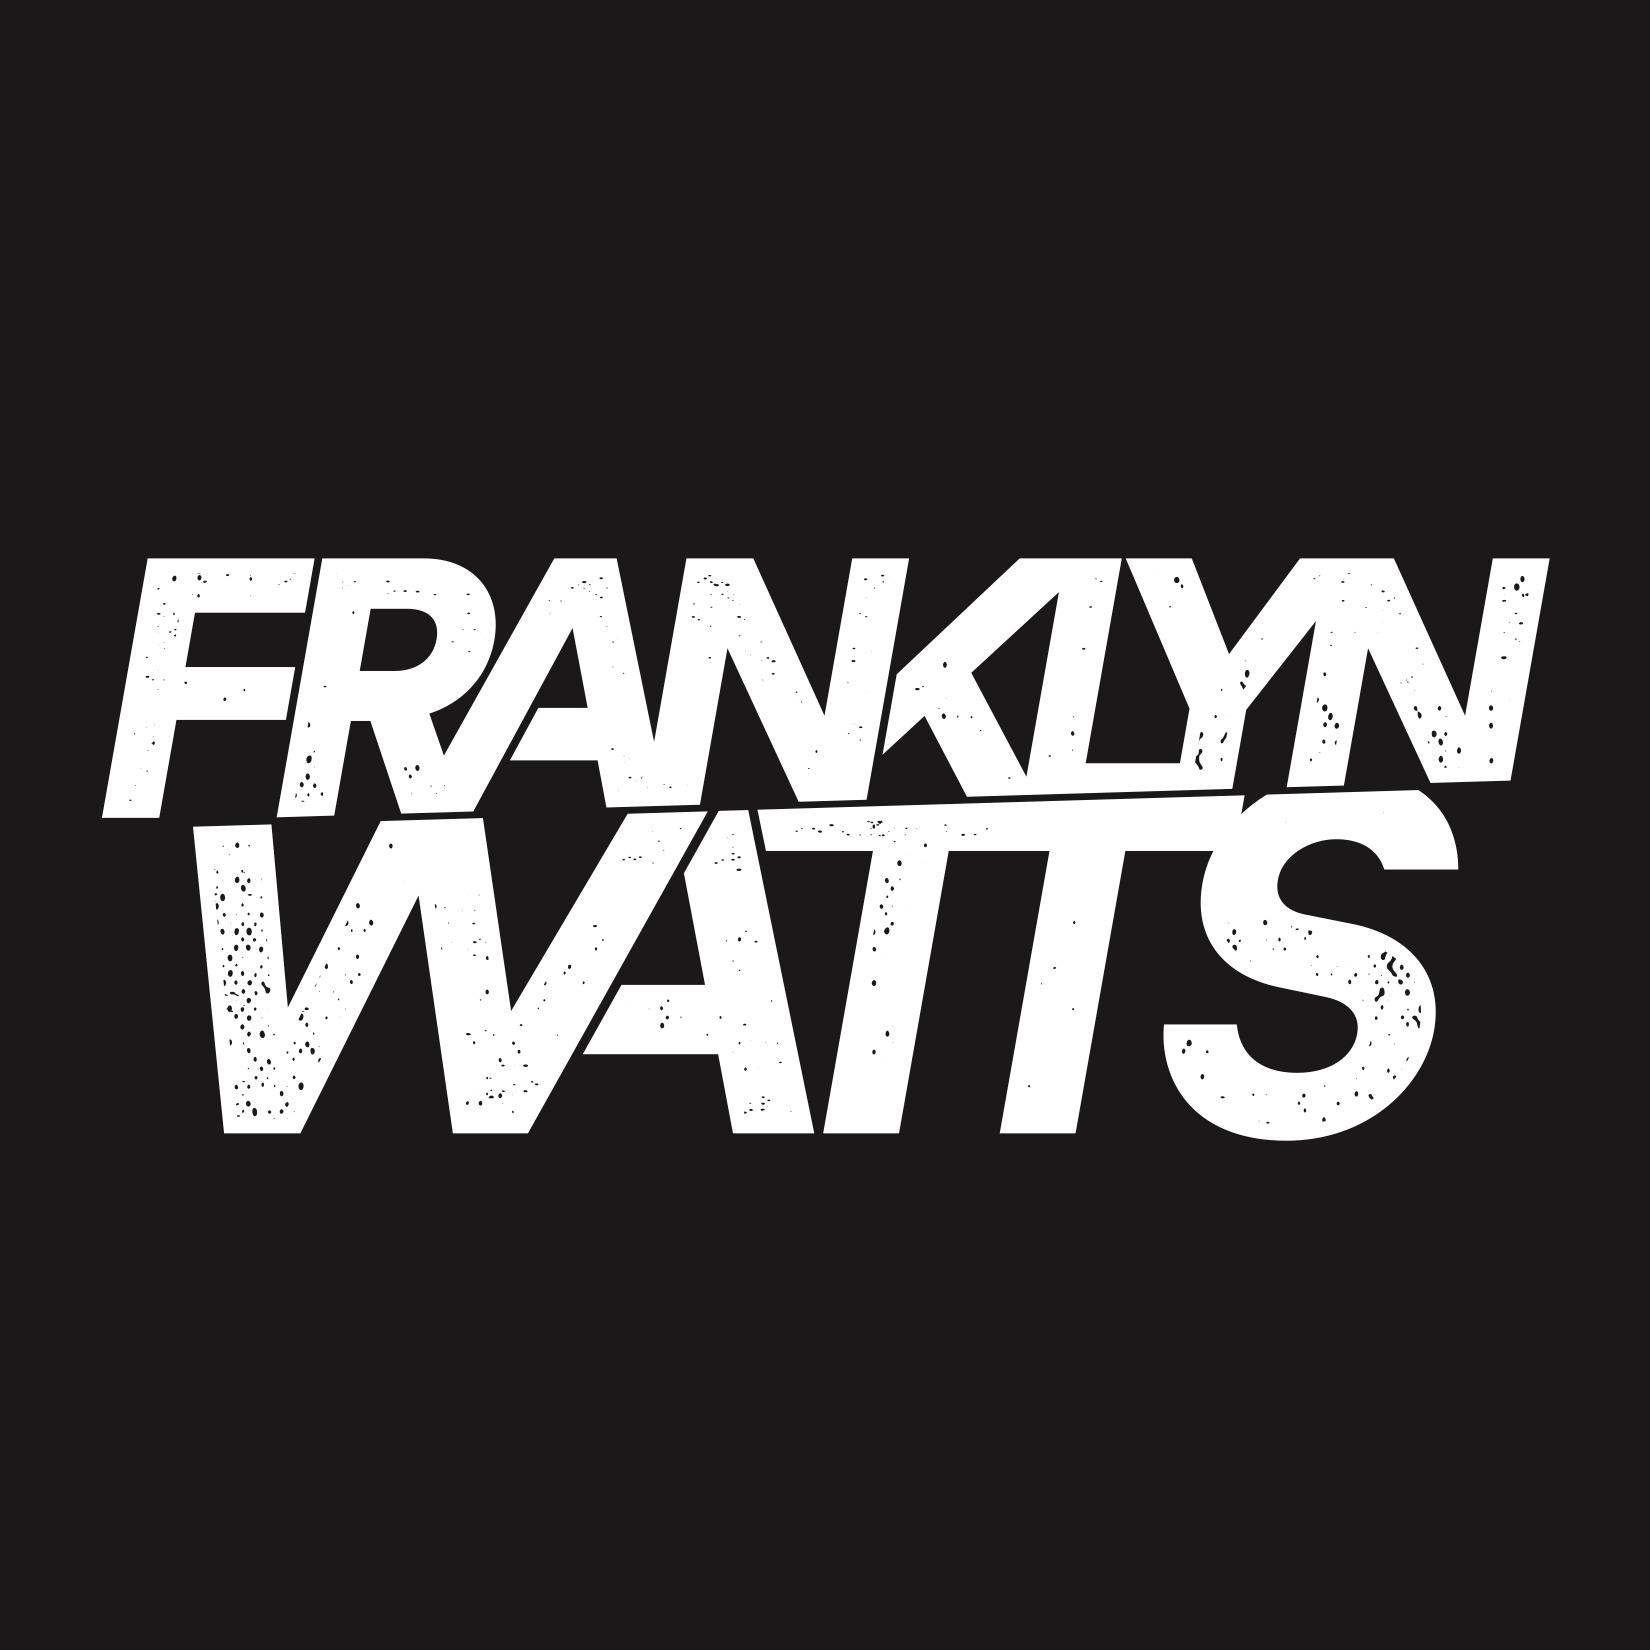 @franklynwatts Profile Image | Linktree